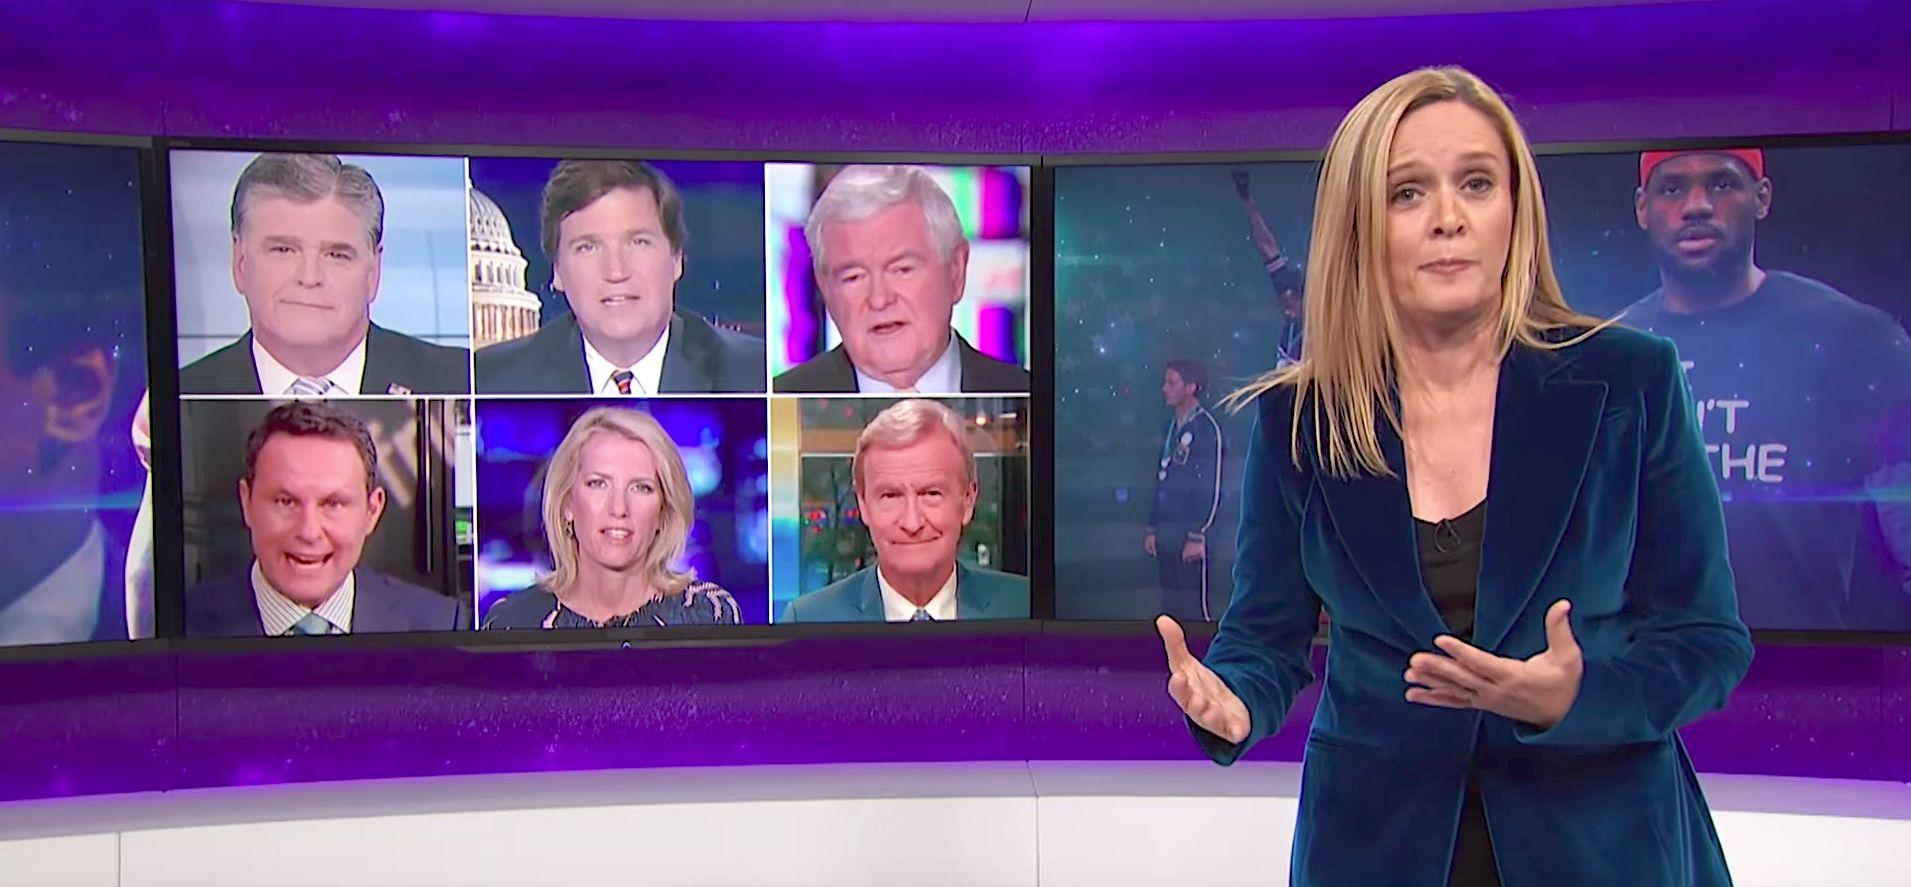 Samantha Bee Skewers Fox News' Hypocrisy Over NFL